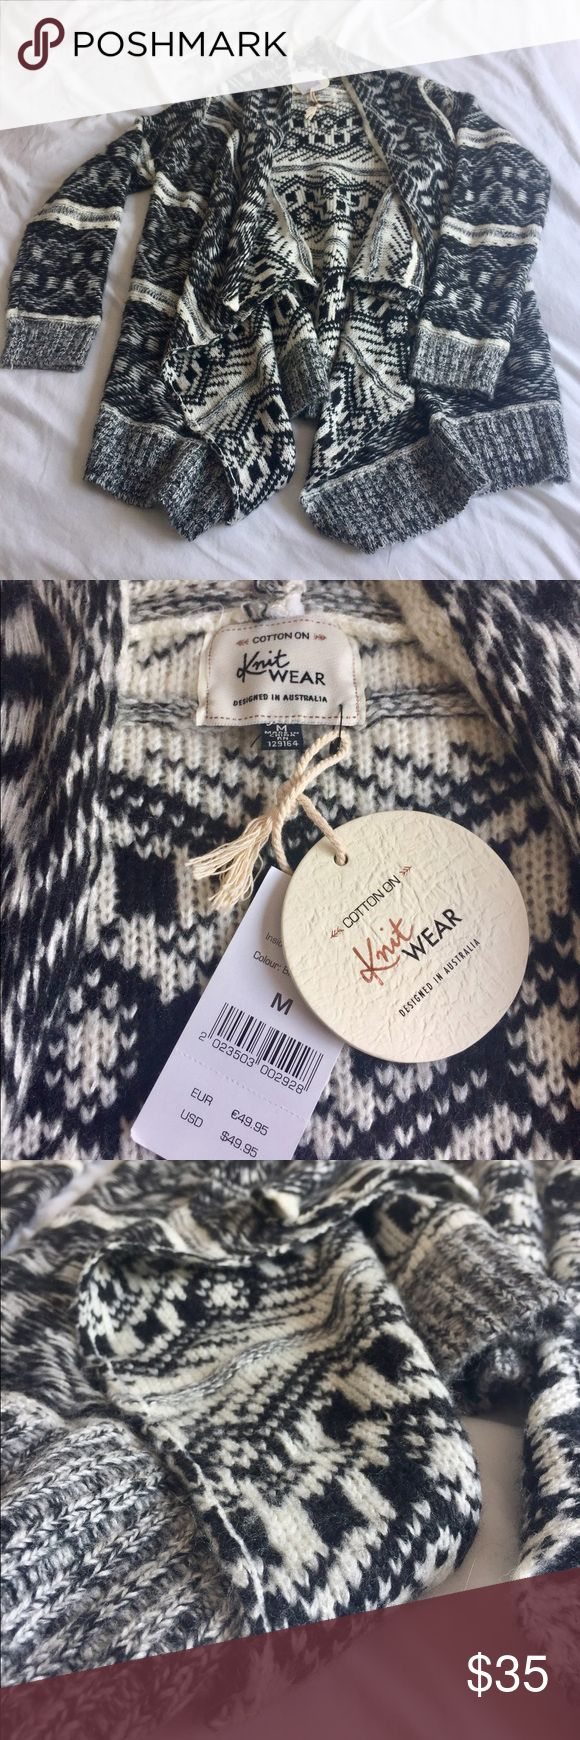 Selling this Boho long sweater (cardigan) on Poshmark! My username is: oarghandiwal. #shopmycloset #poshmark #fashion #shopping #style #forsale #Cotton On #Sweaters